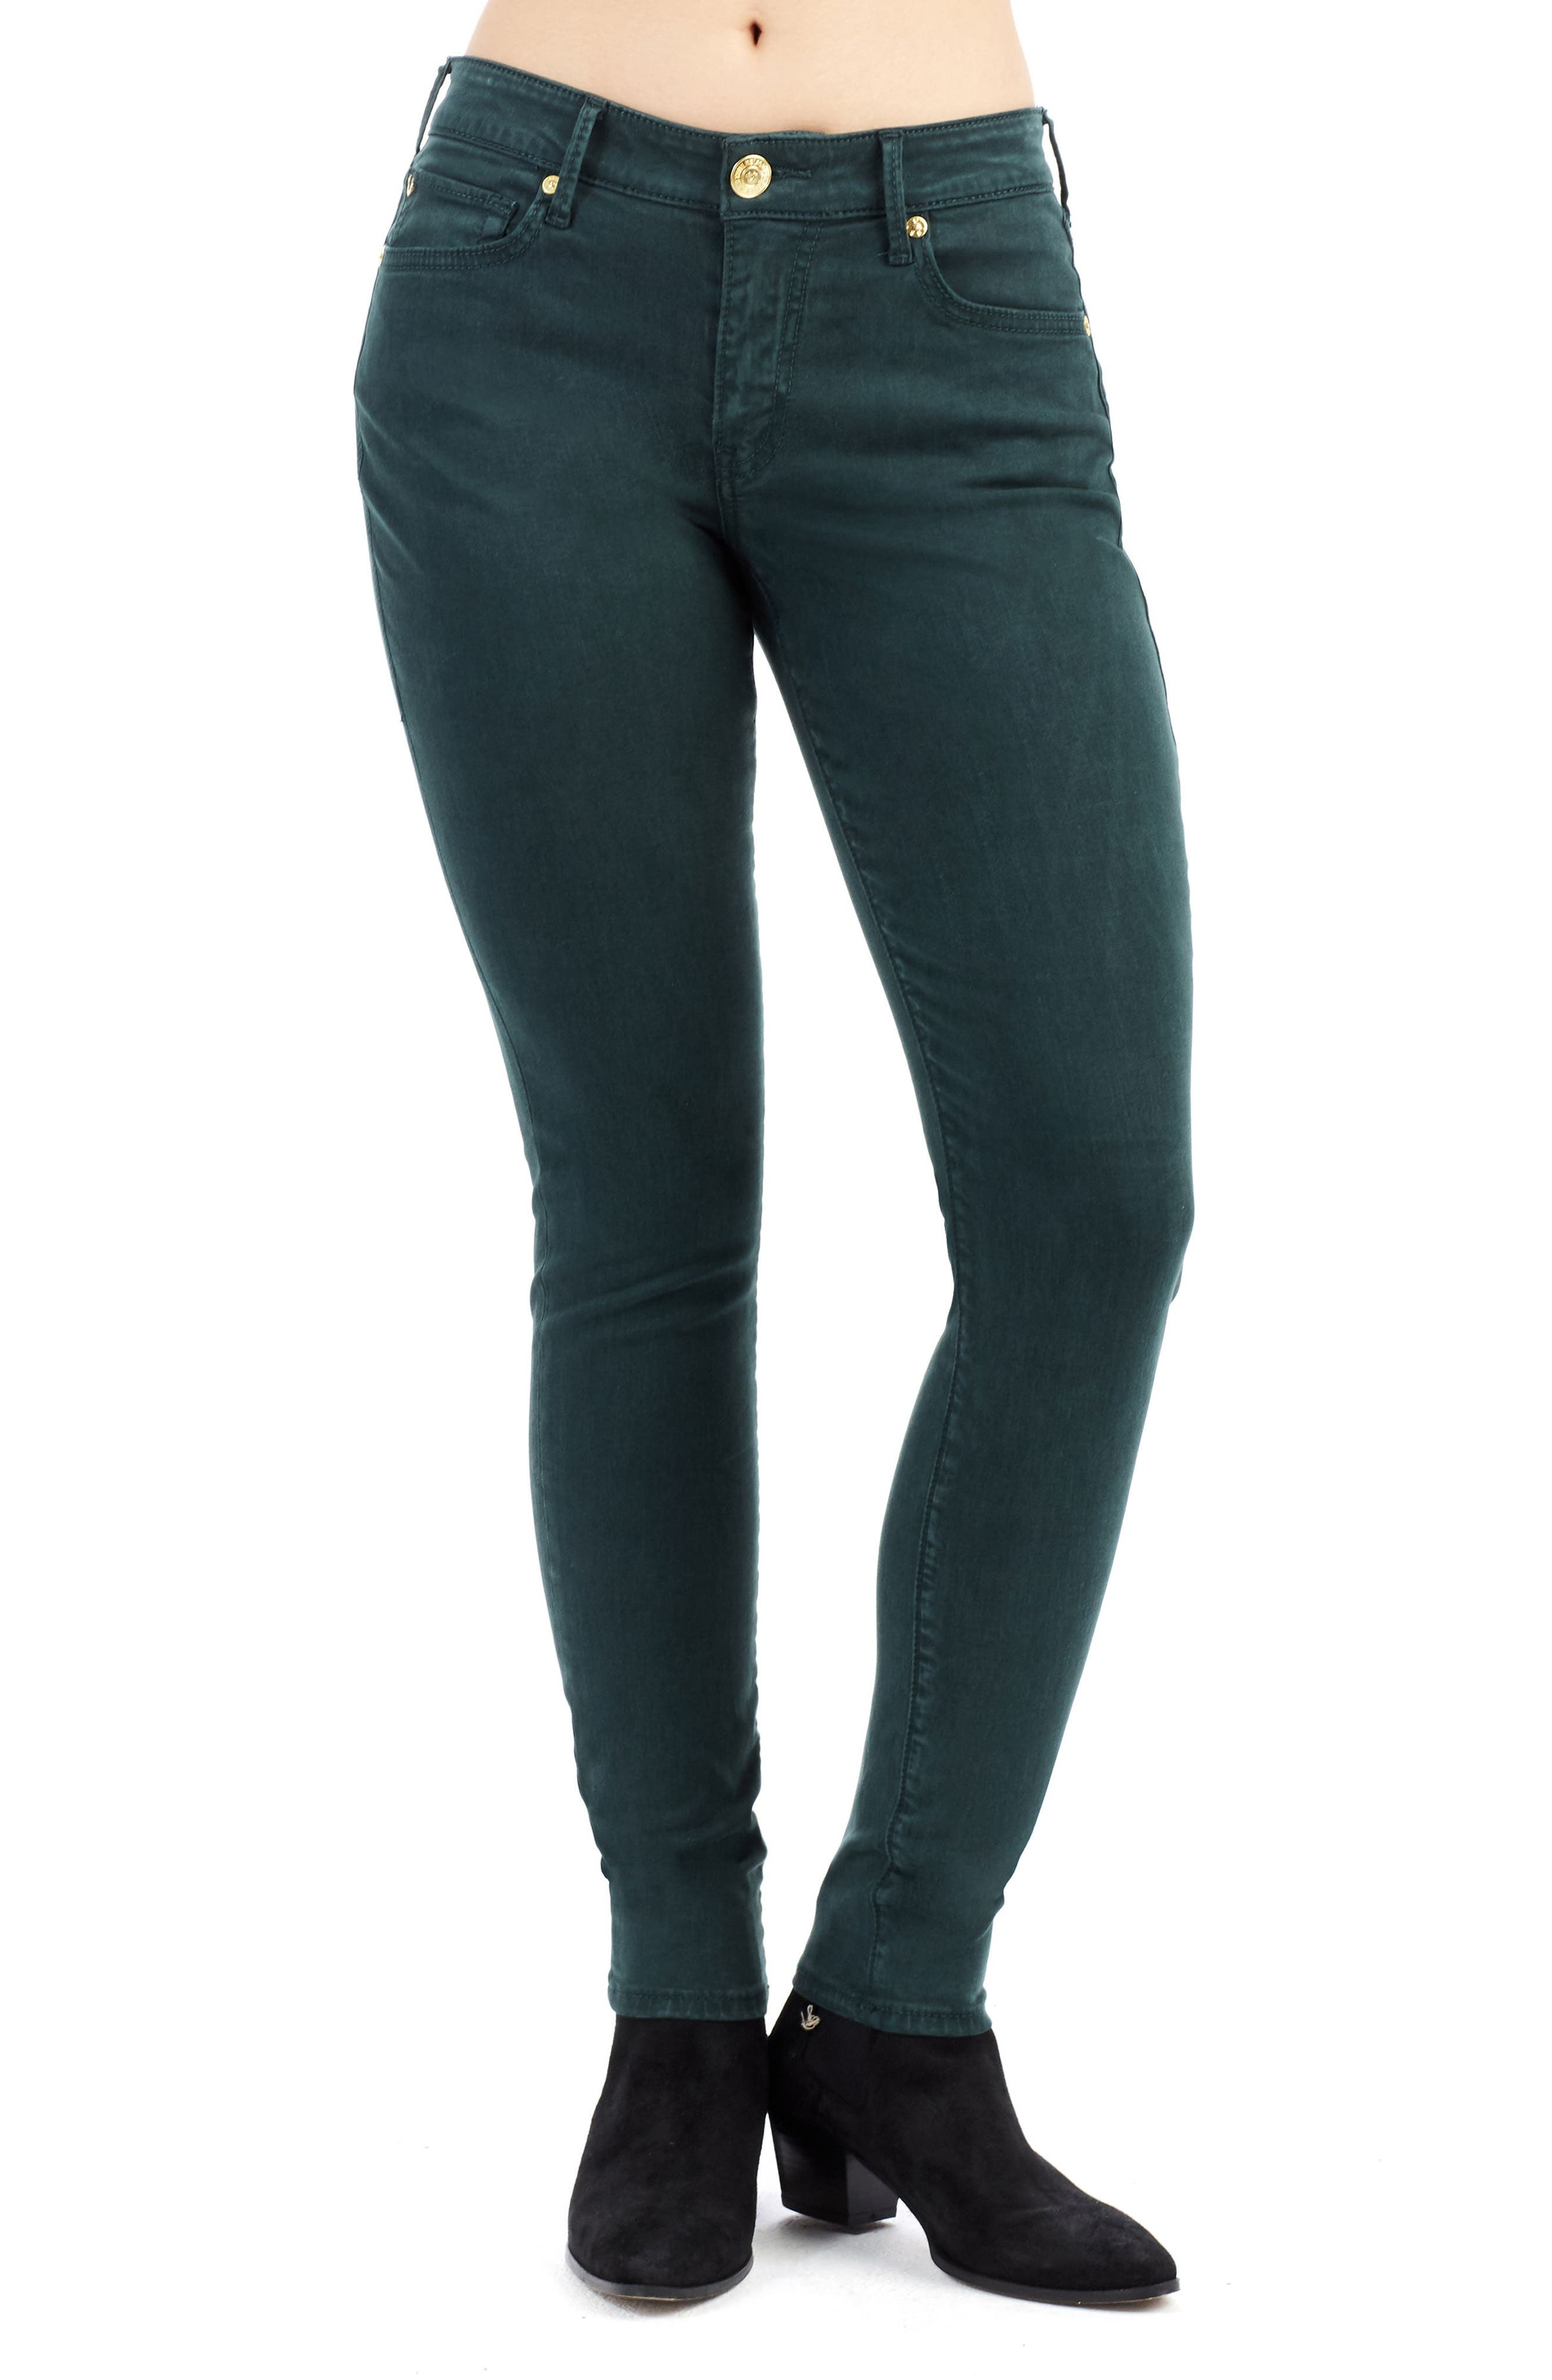 Jennie Curvy Skinny Jeans,                             Main thumbnail 1, color,                             Hunter Green